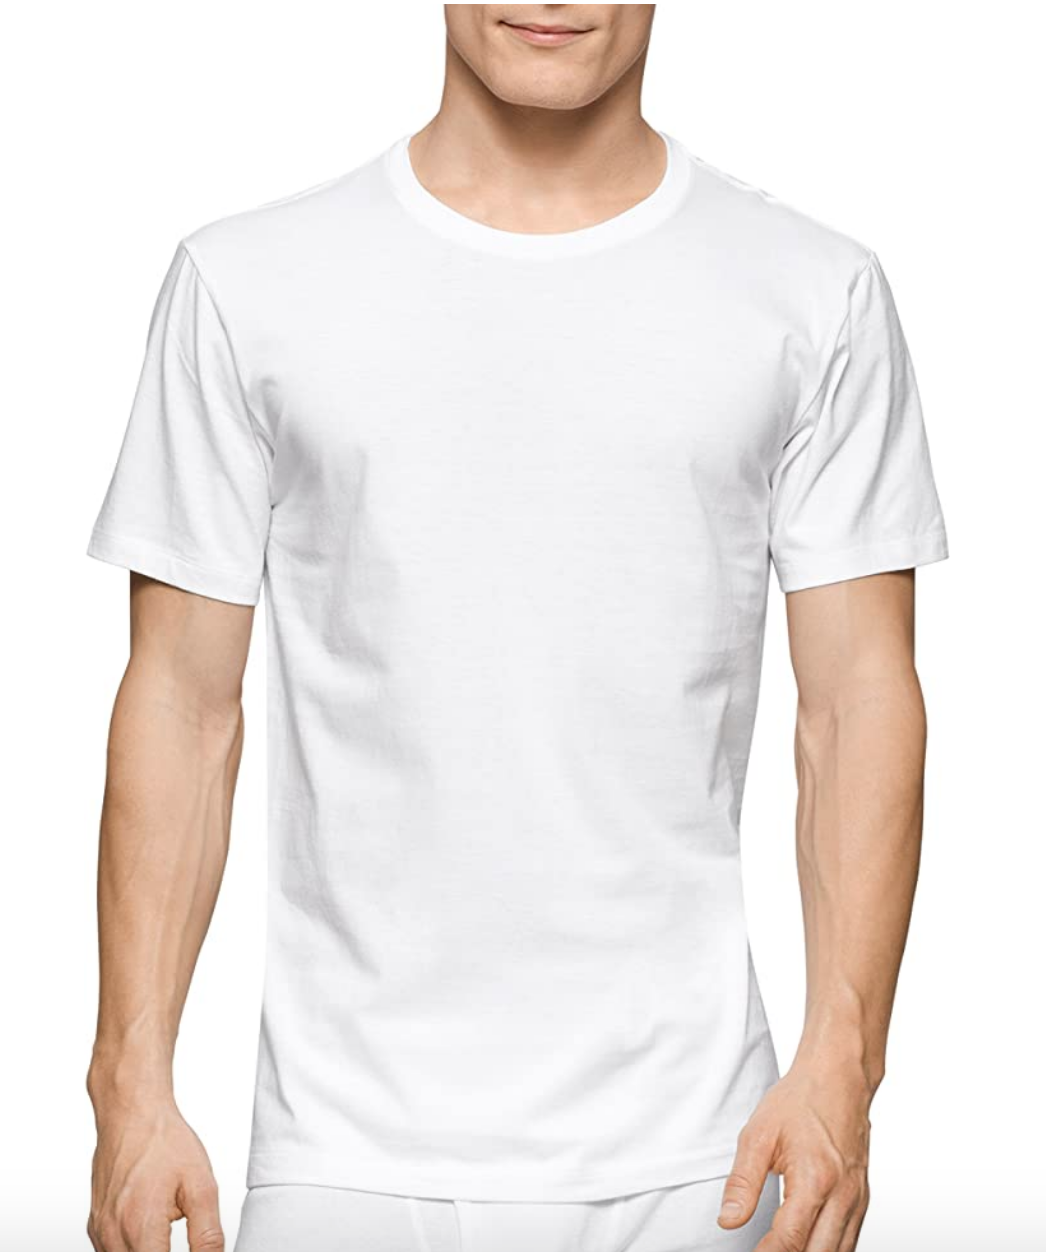 White t shirt men's calvin klein